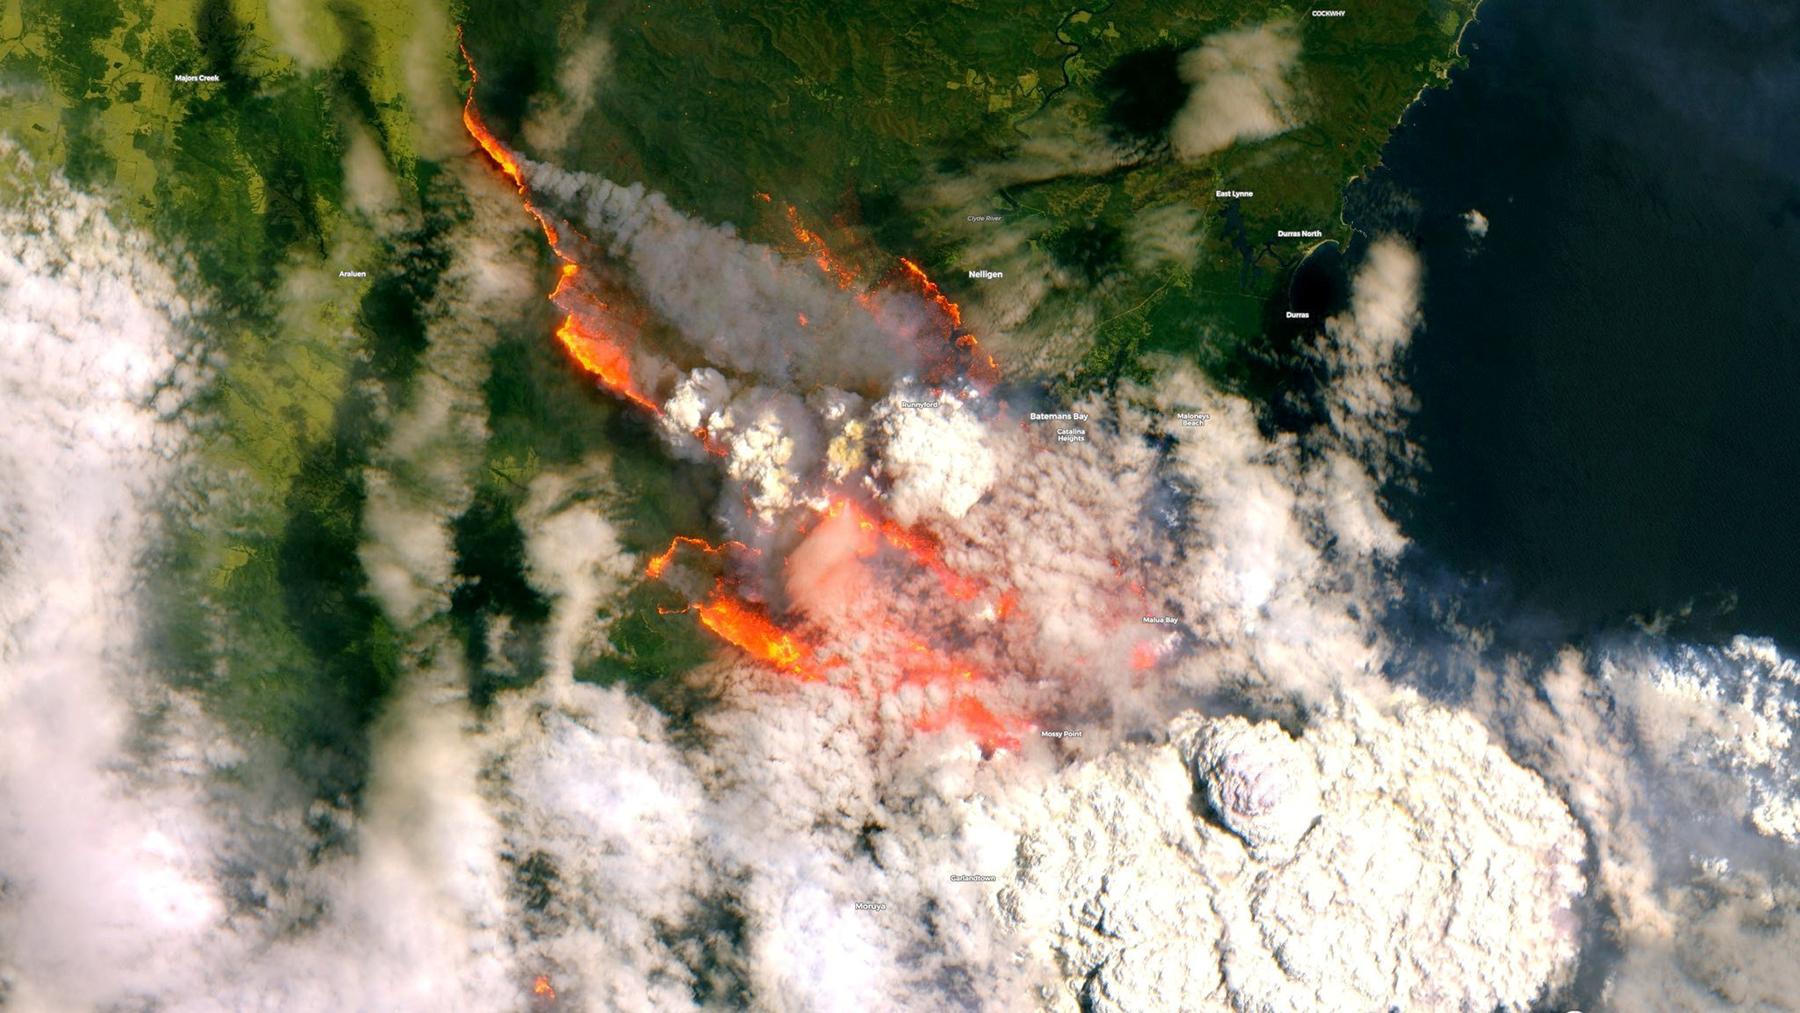 Bushfires burn across Australia on Dec. 31, 2019, as seen from satellite imagery above. (Copernicus Sentinel photo)